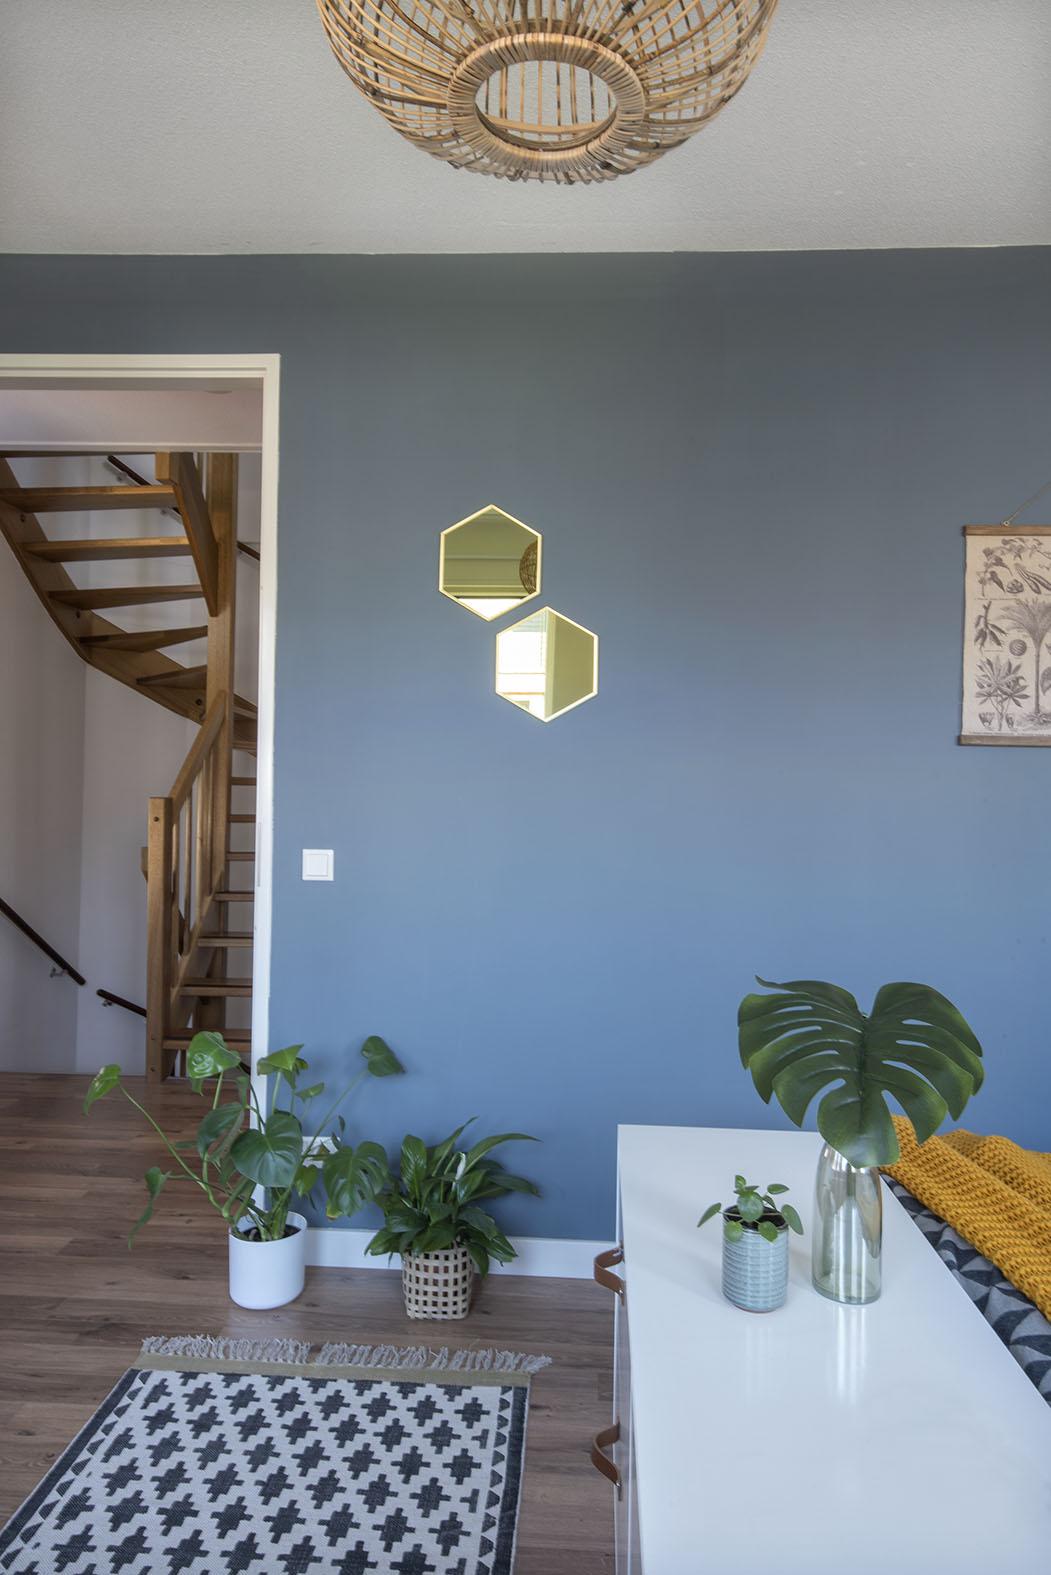 Slaapkamer-interieur-ontwerp-blauw-luipaard-styling-groen-11